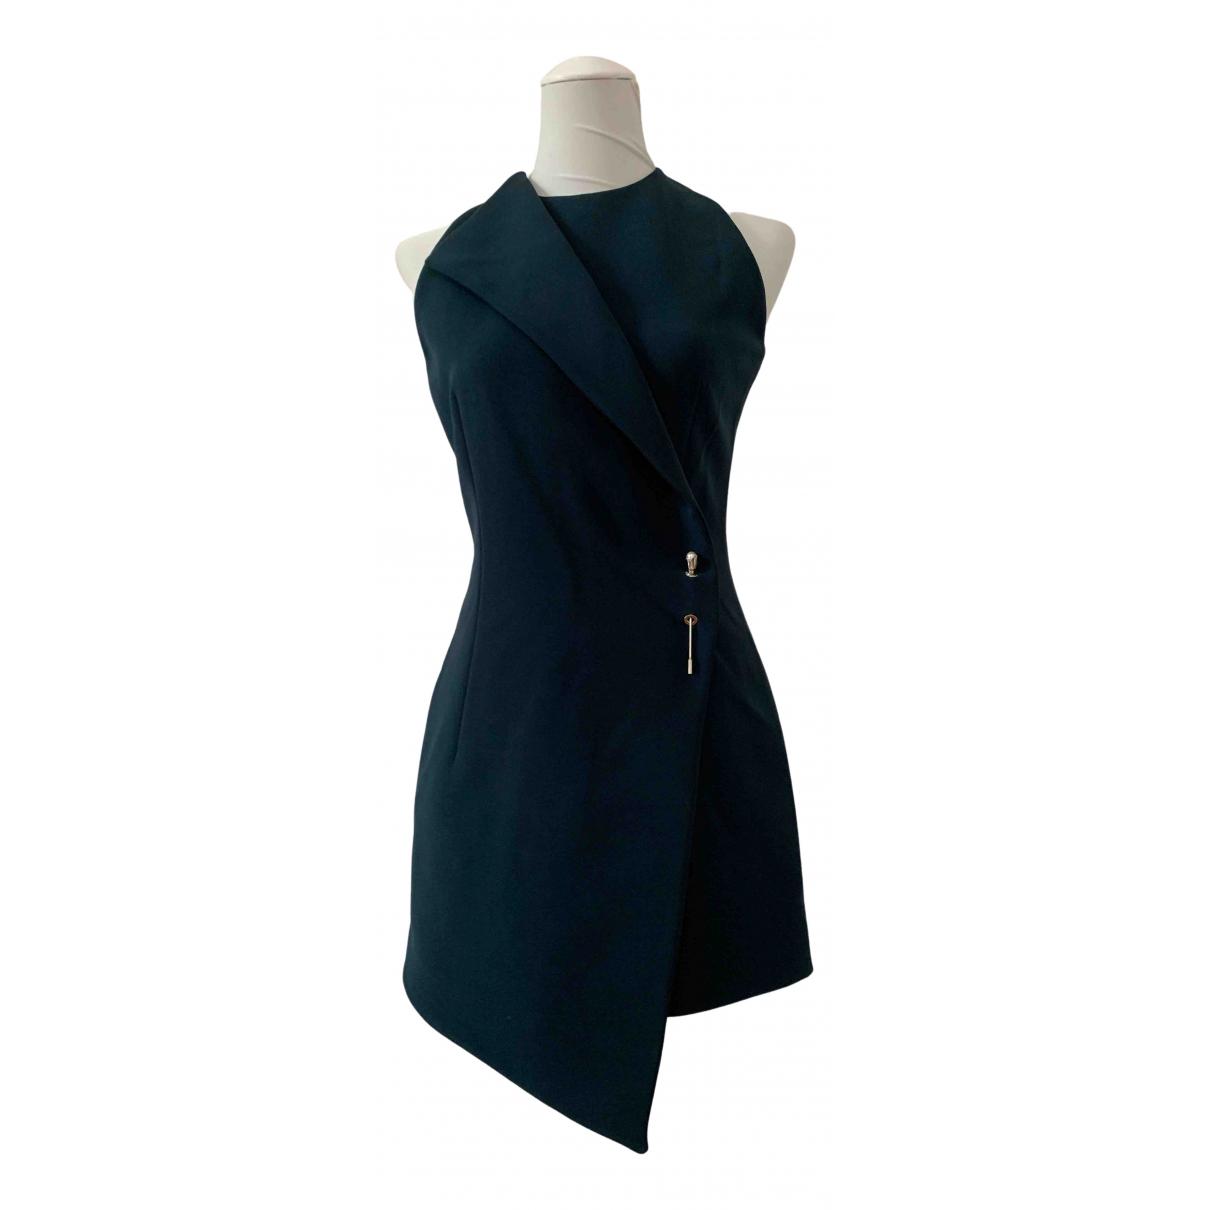 Balenciaga \N Kleid in  Gruen Polyester